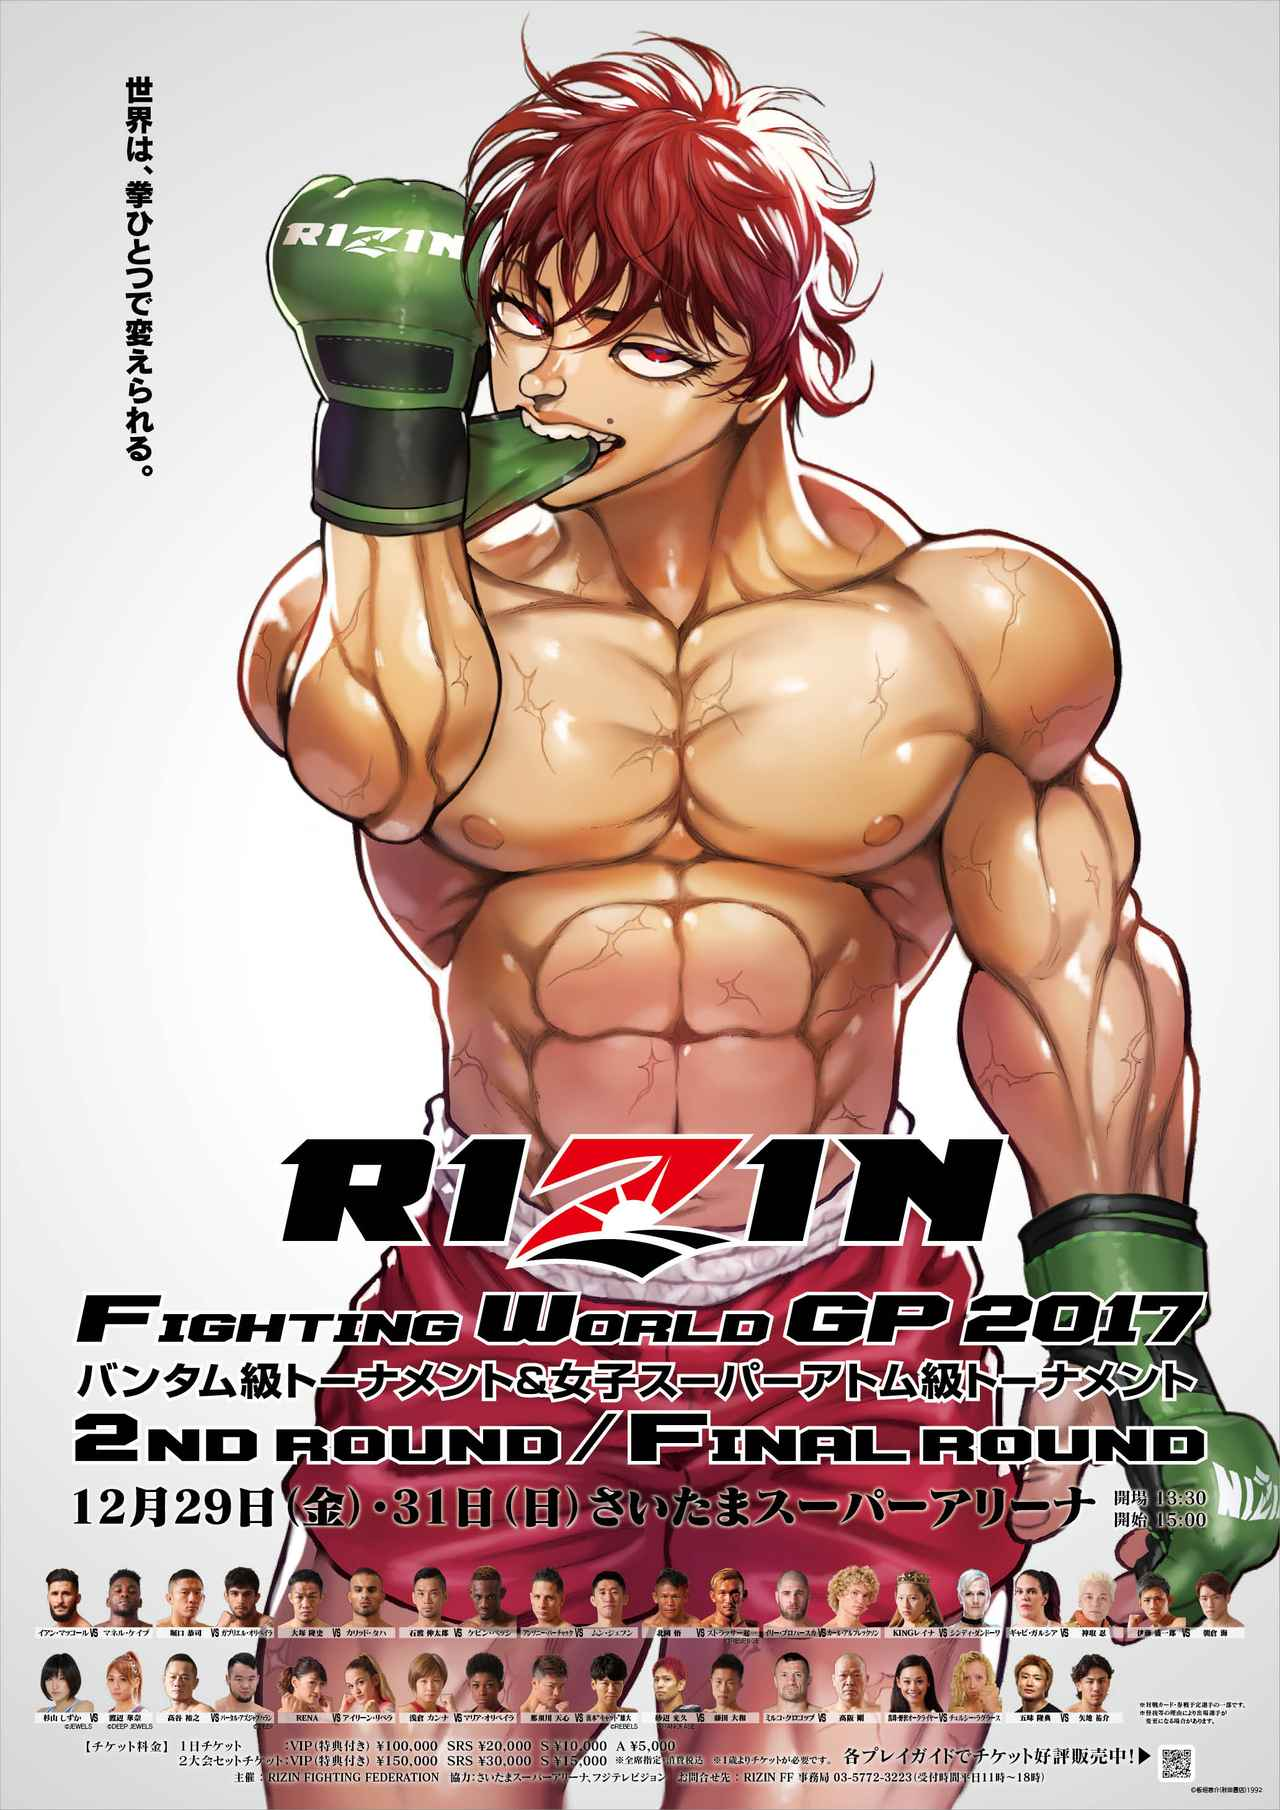 RIZIN FIGHTING WORLD GRAND-PRIX 2017 バンタム級トーナメント&女子スーパーアトム級トーナメントFinal ROUND